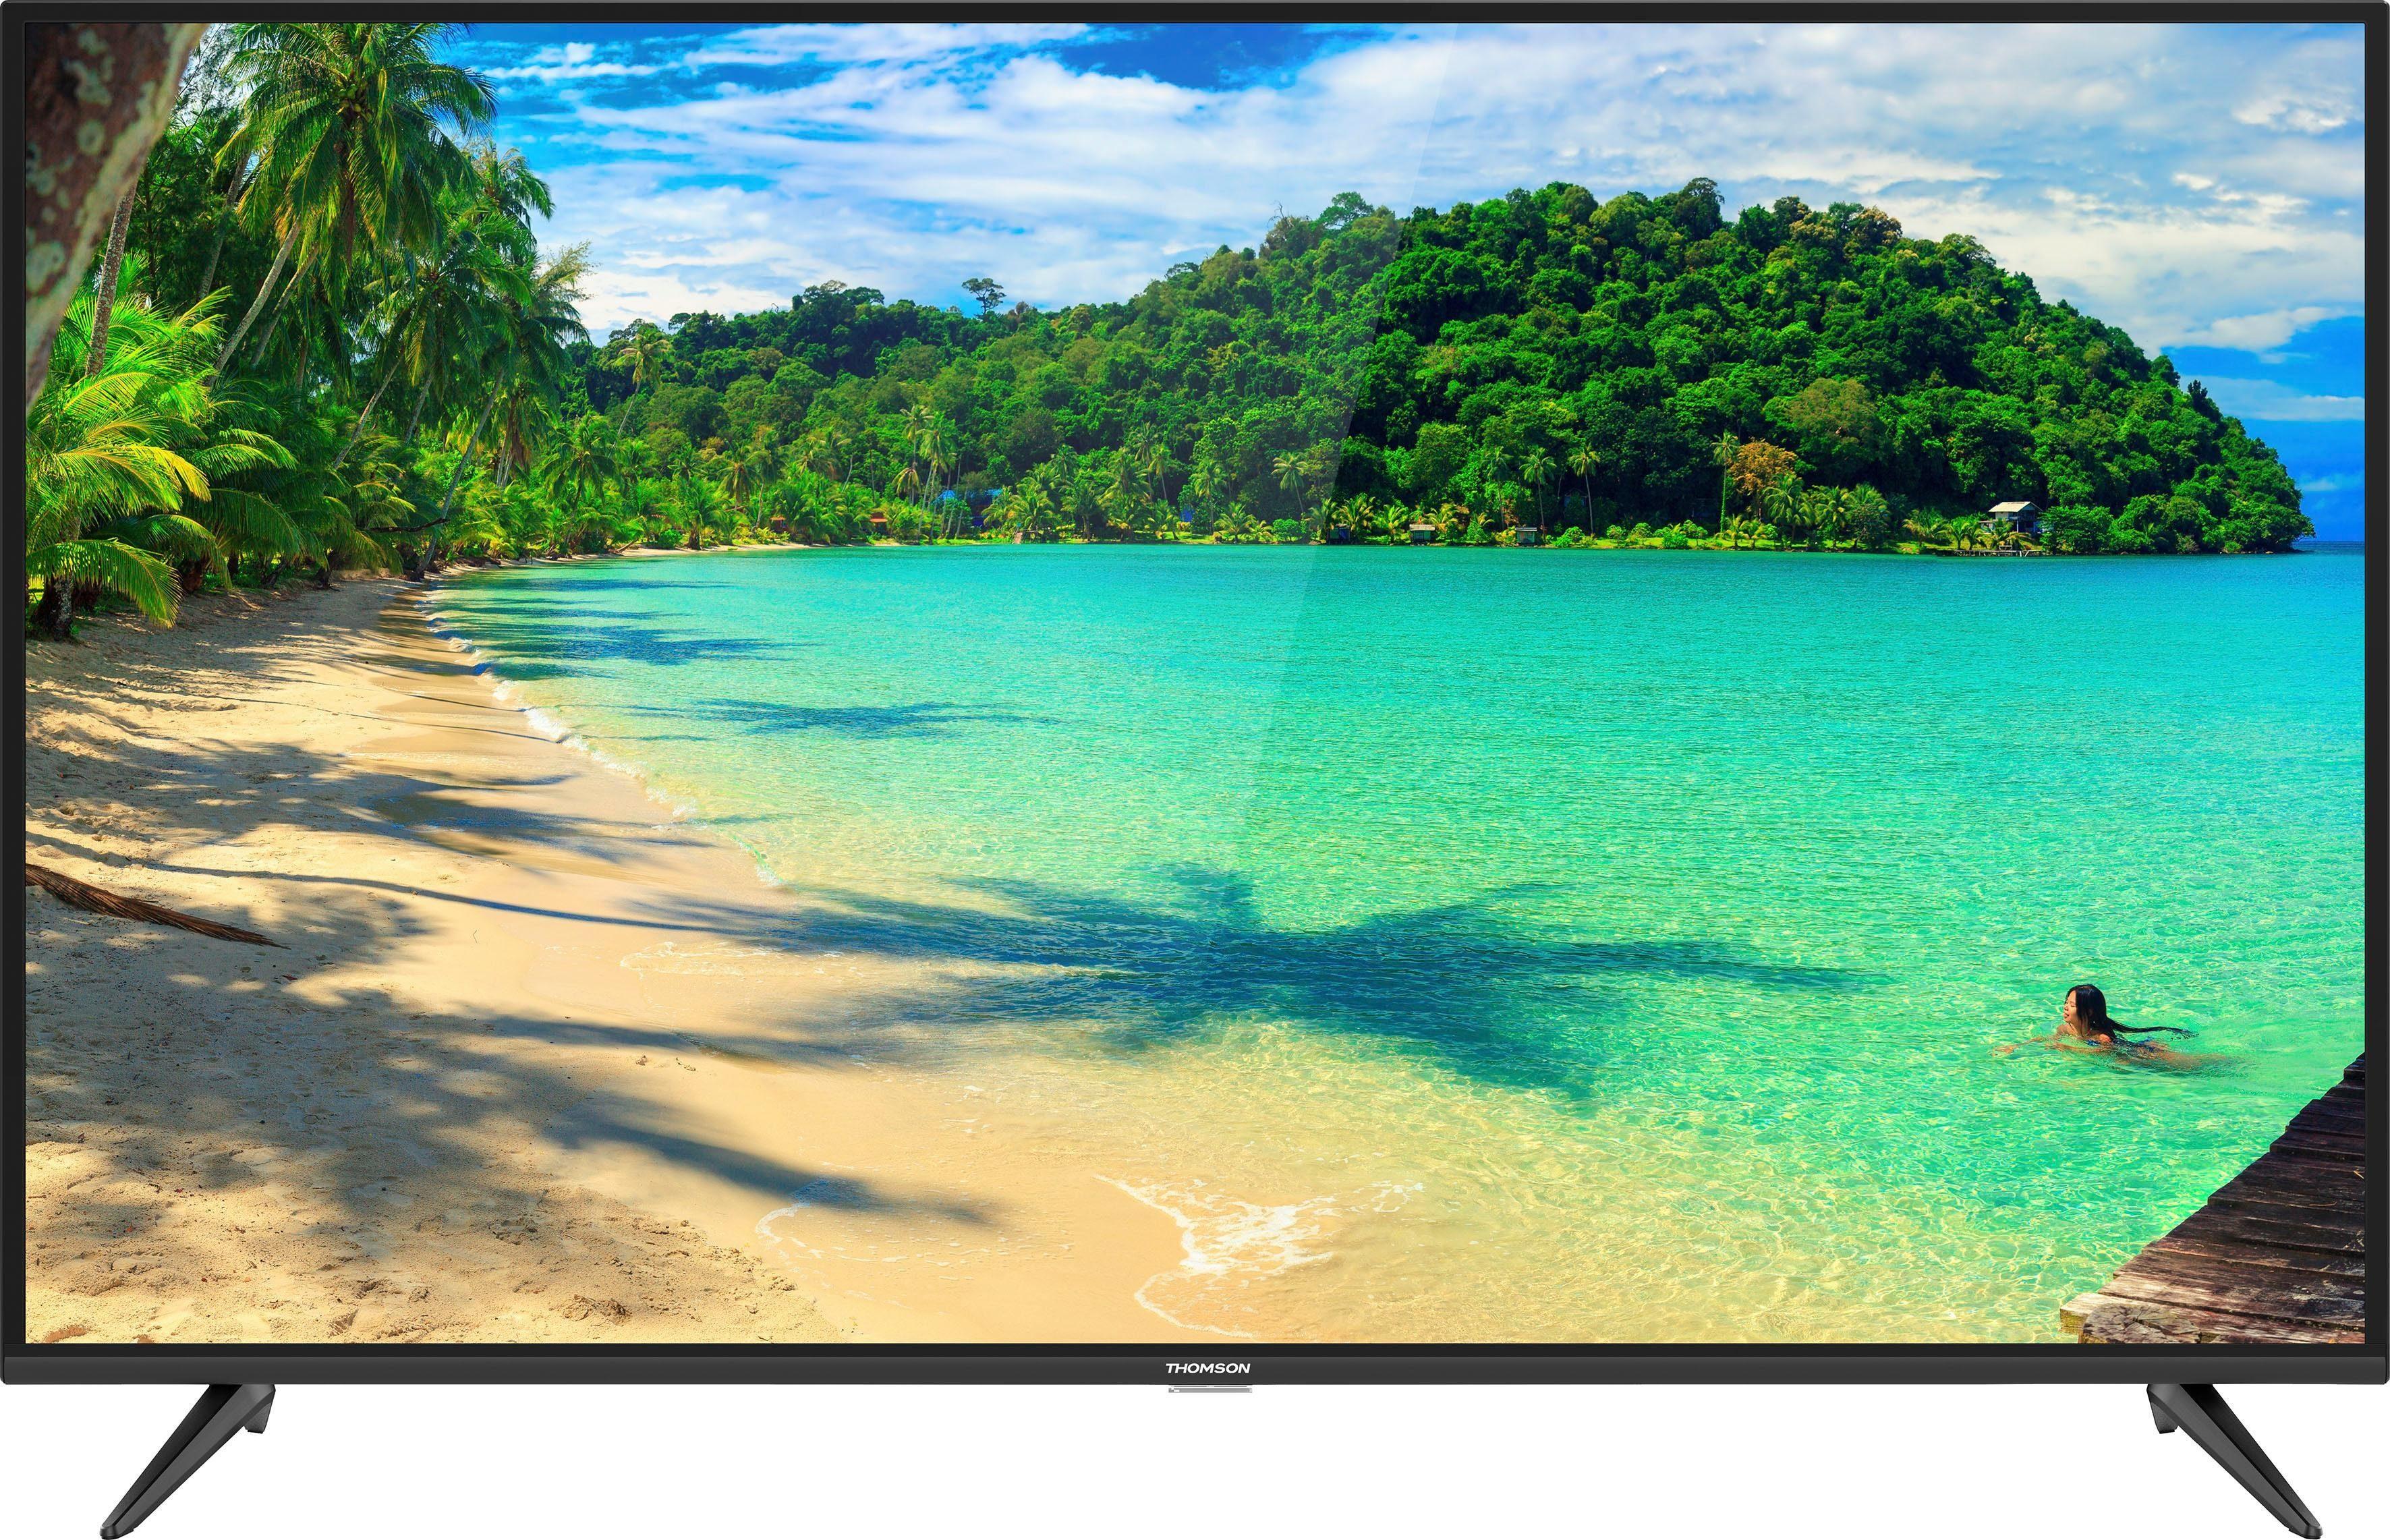 Thomson 50UD6326X1 LED-Fernseher (126 cm/50 Zoll, 4K Ultra HD, Smart-TV)